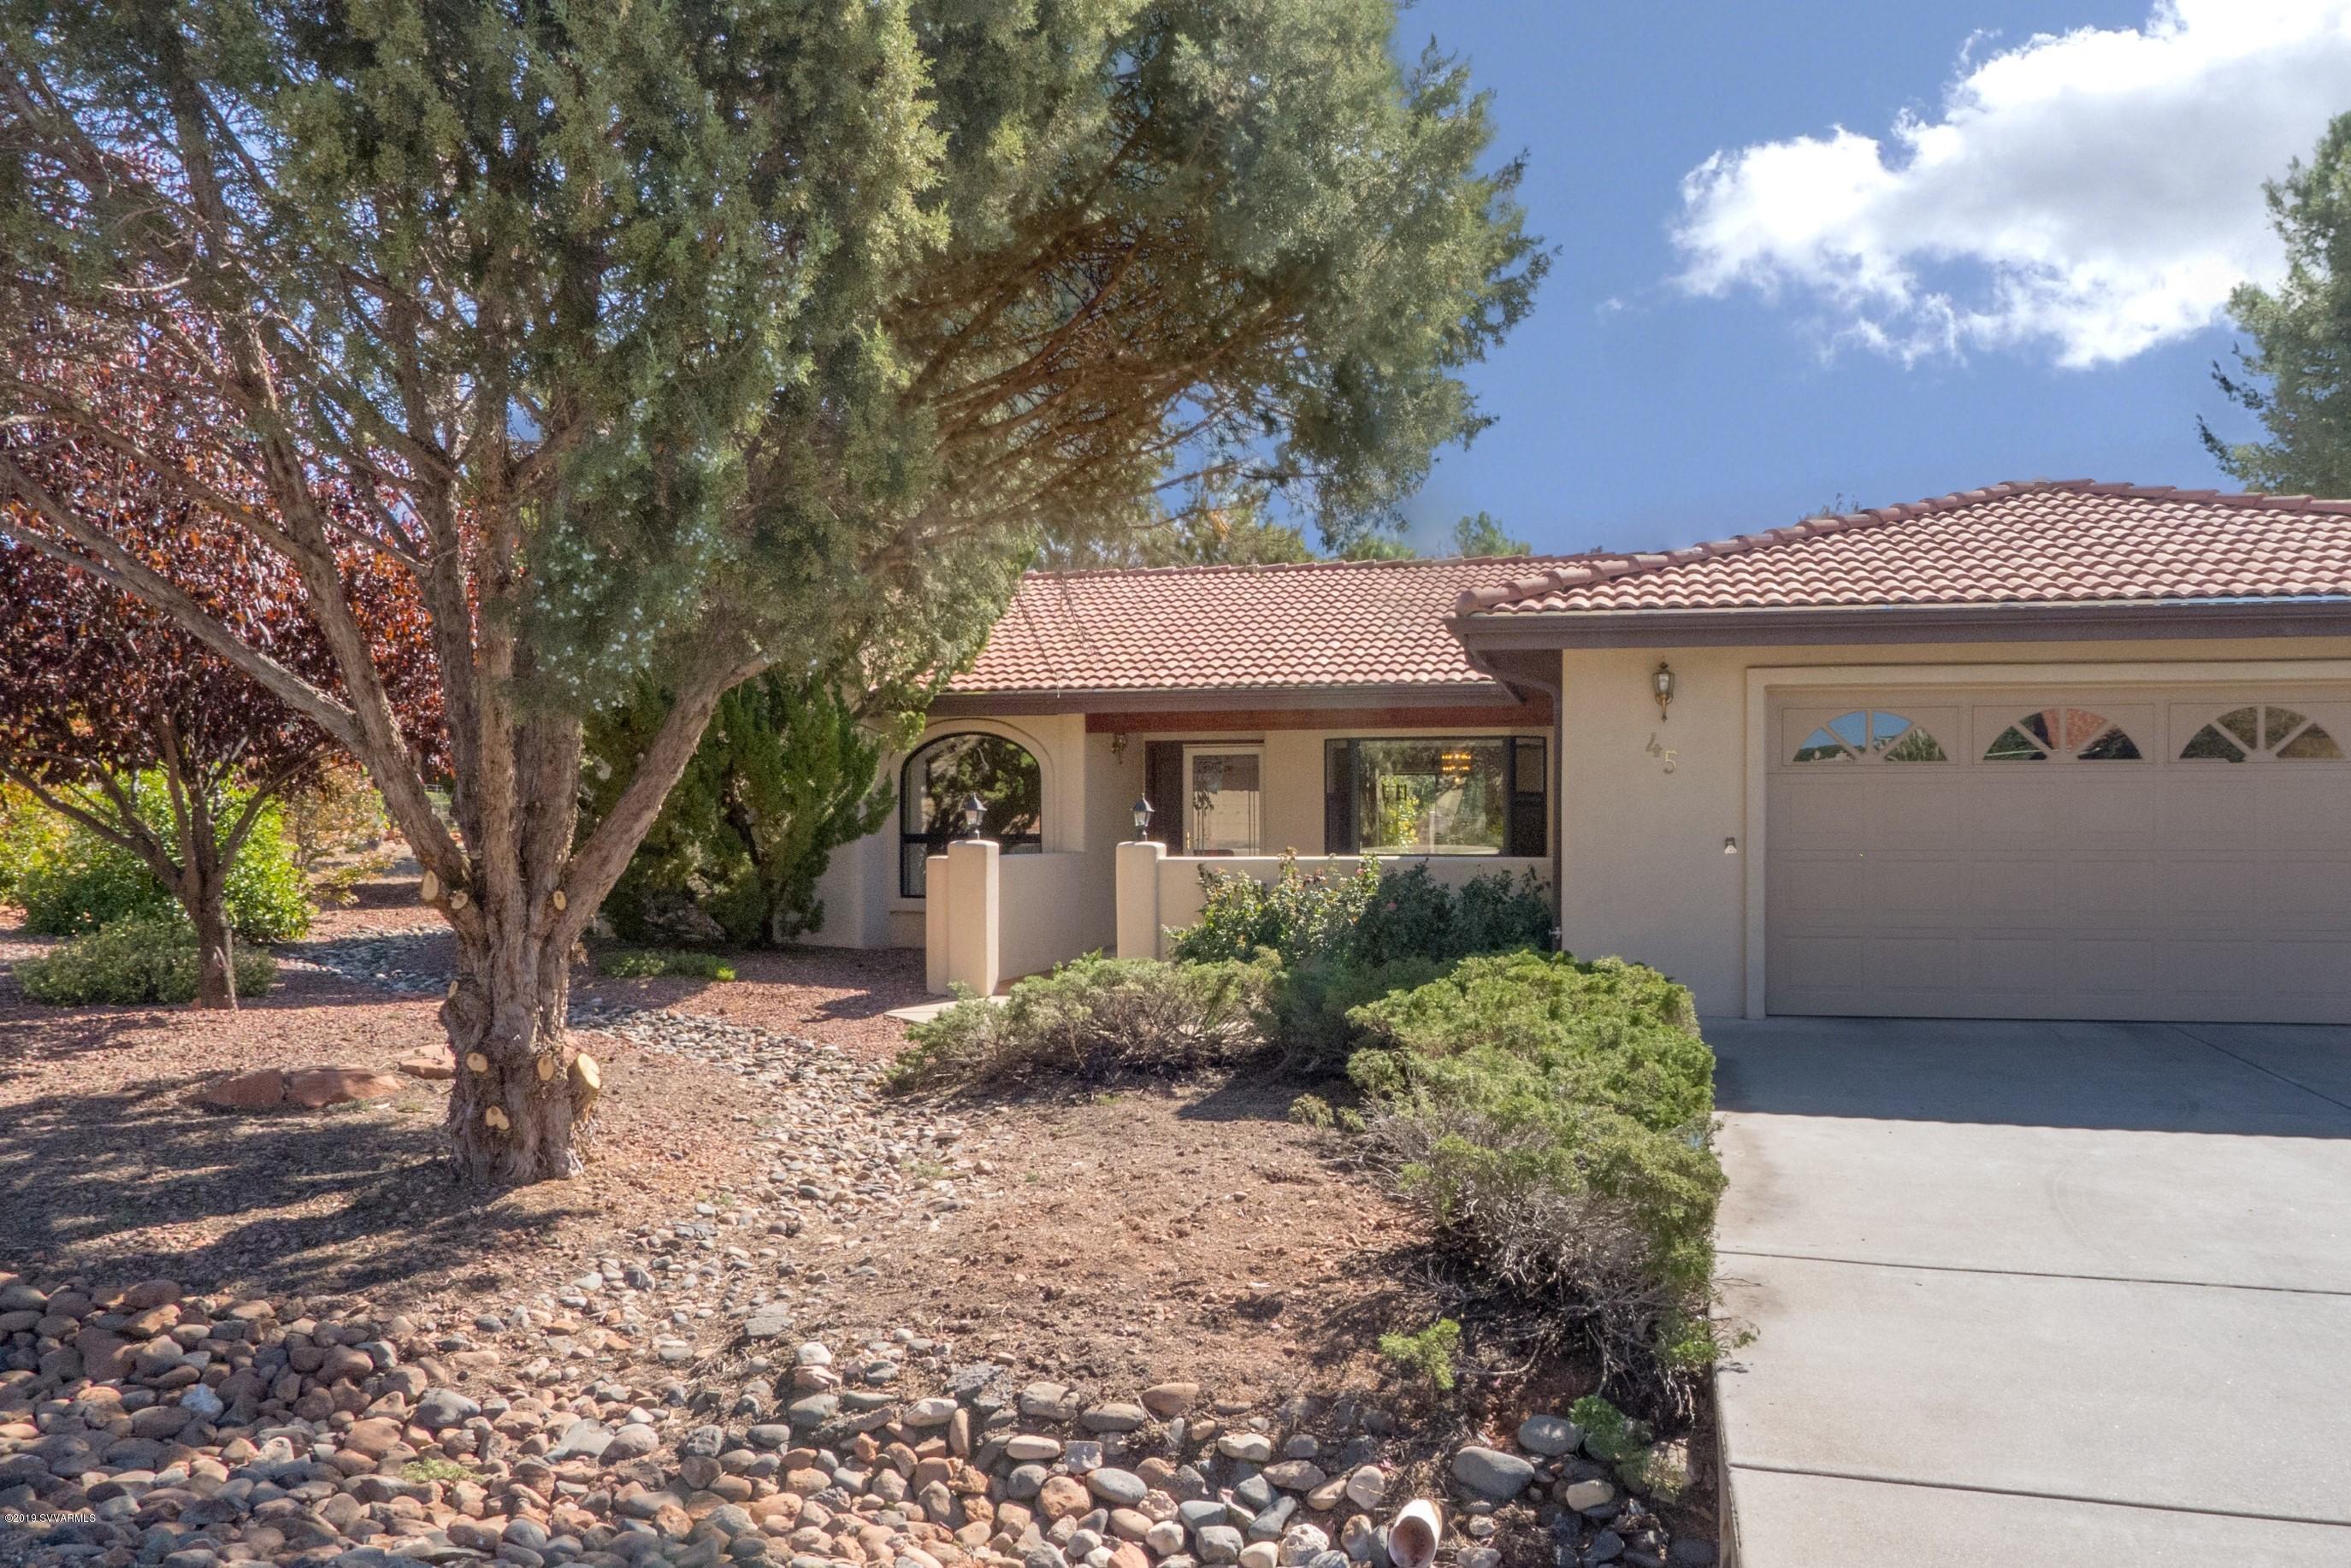 45 Rim Trail Drive Sedona, AZ 86351